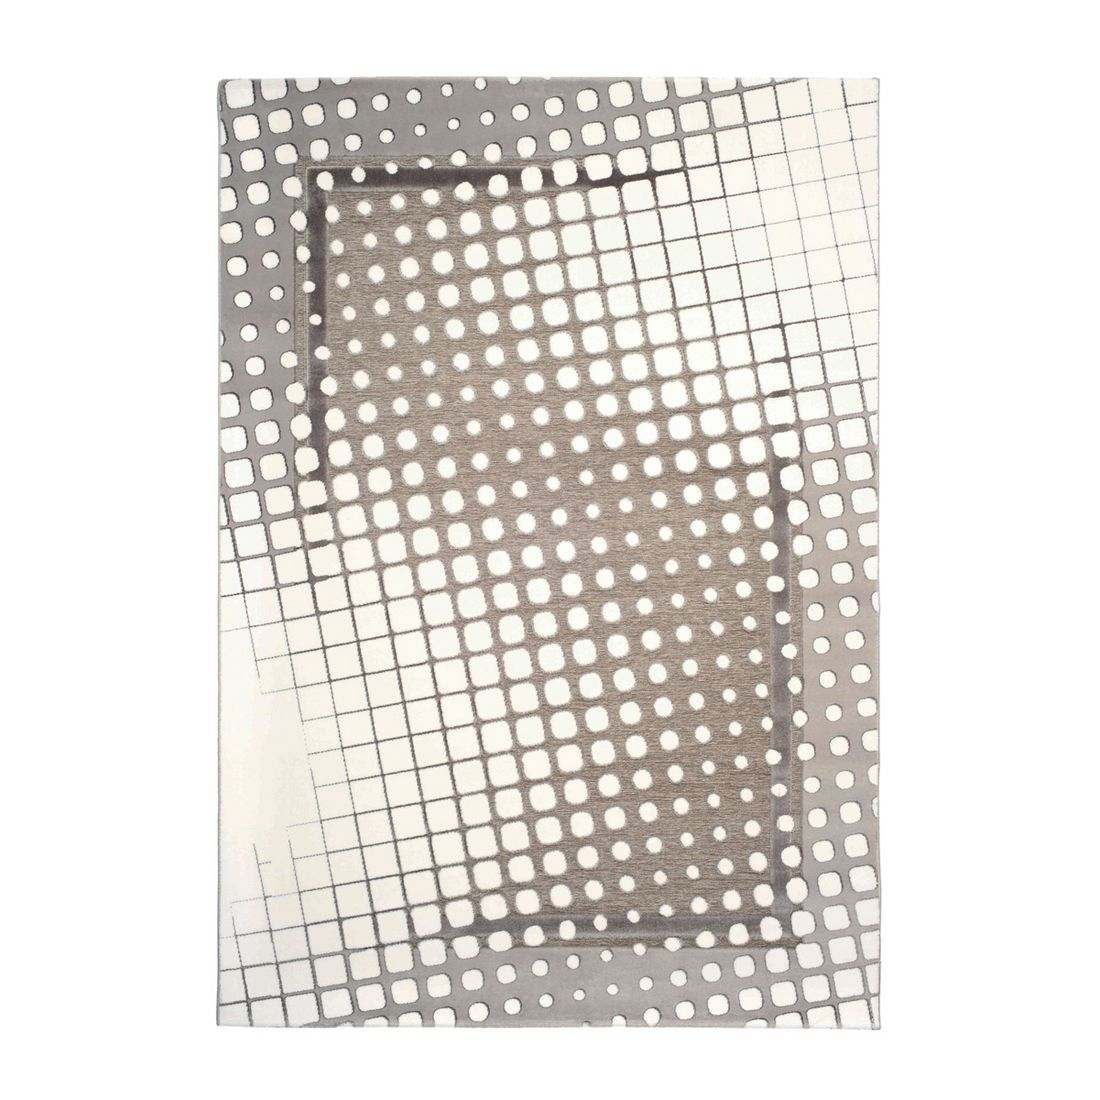 Nano Teppich Damla Dama – Grau – Maße: 80 x 300 cm, Kayoom günstig online kaufen